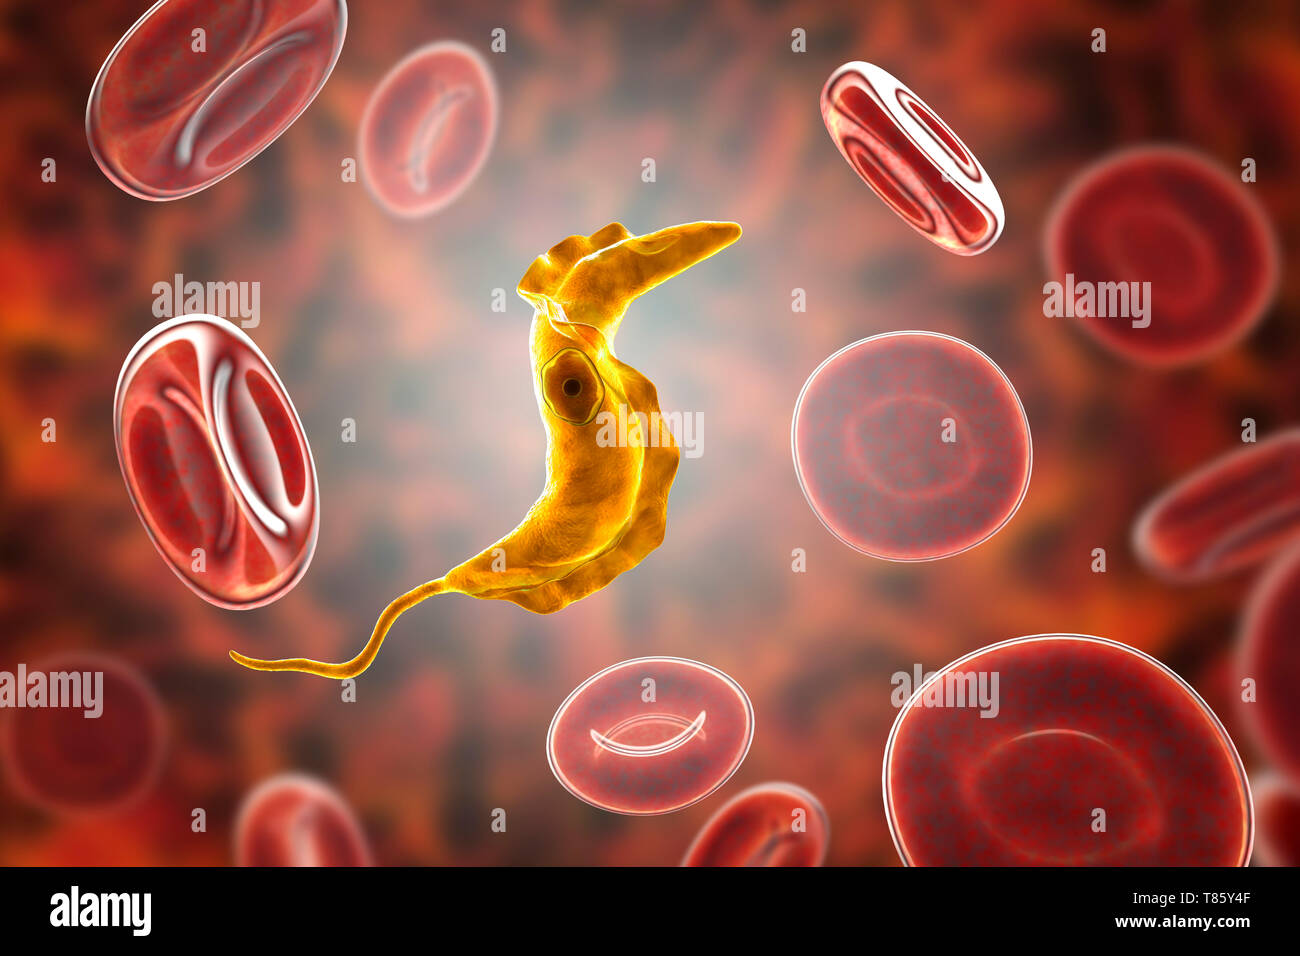 Chagas disease parasite, illustration - Stock Image